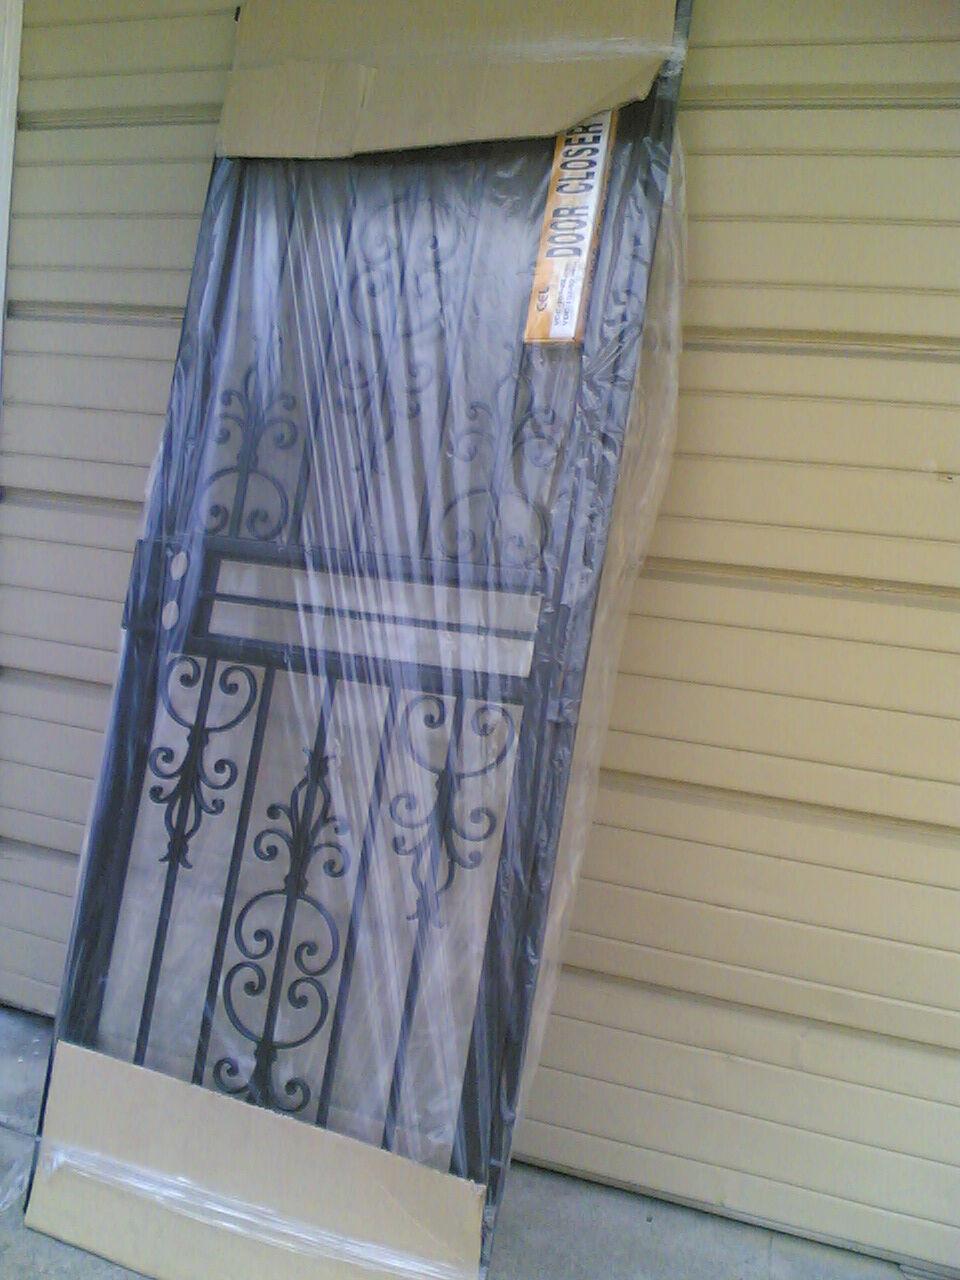 30x80 Metal Security Storm Door & Frame Full Glass Closer Kit | eBay